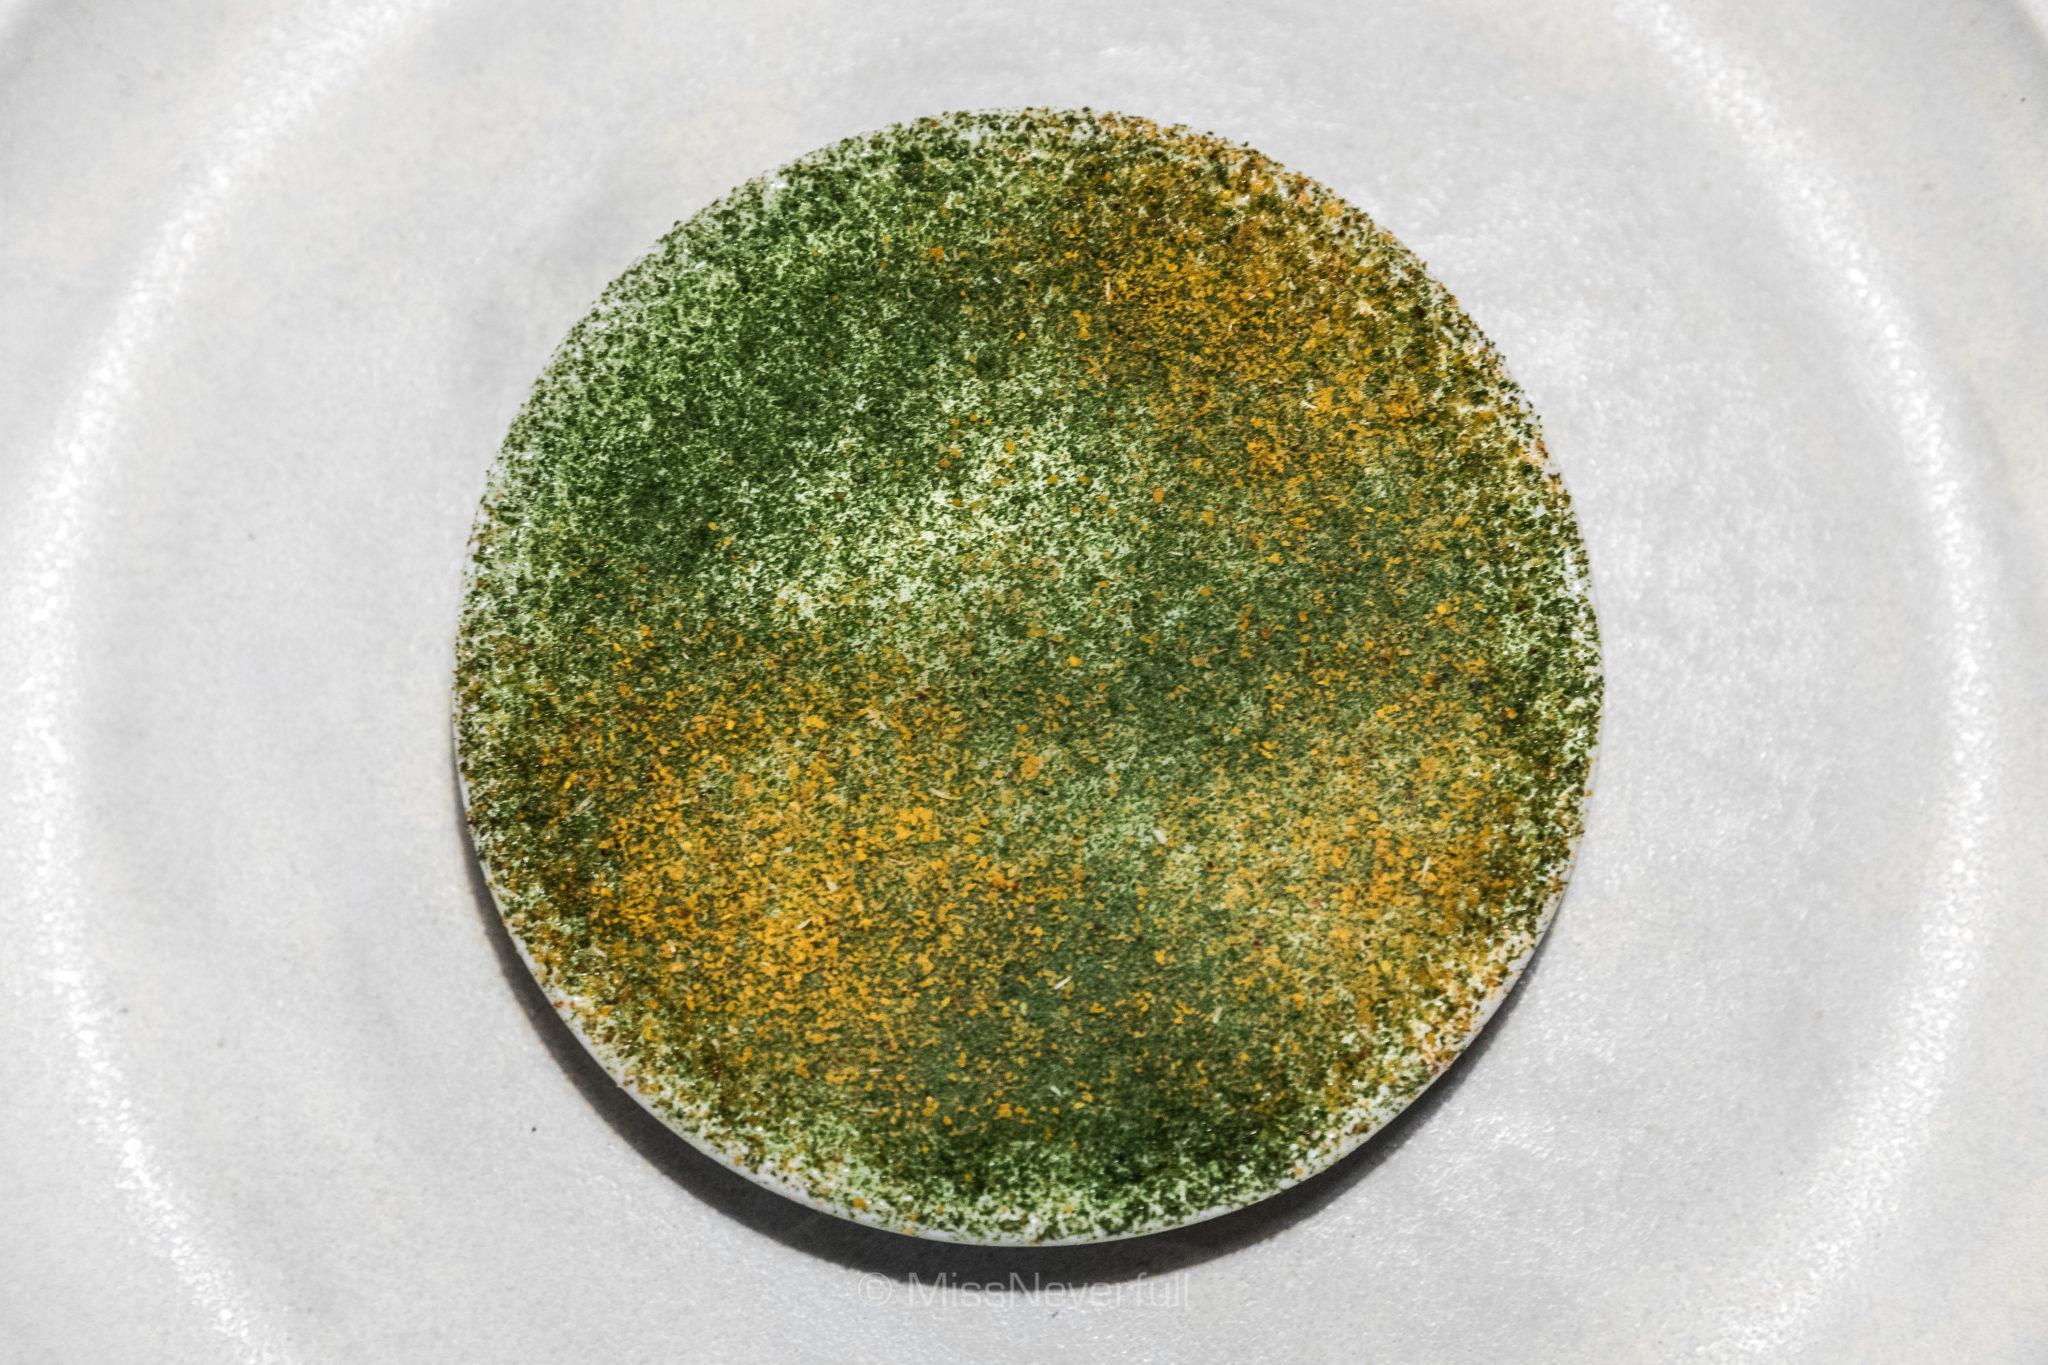 9. Yogurt, marigold & lemo